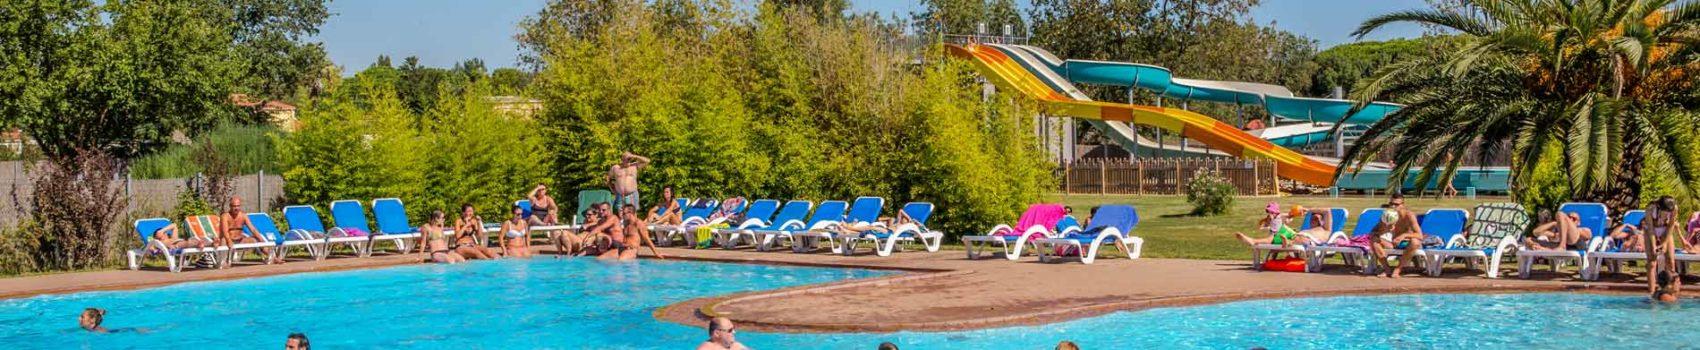 Piscine argeles sur mer camping zwembad argeles sur mer for Camping dives sur mer avec piscine